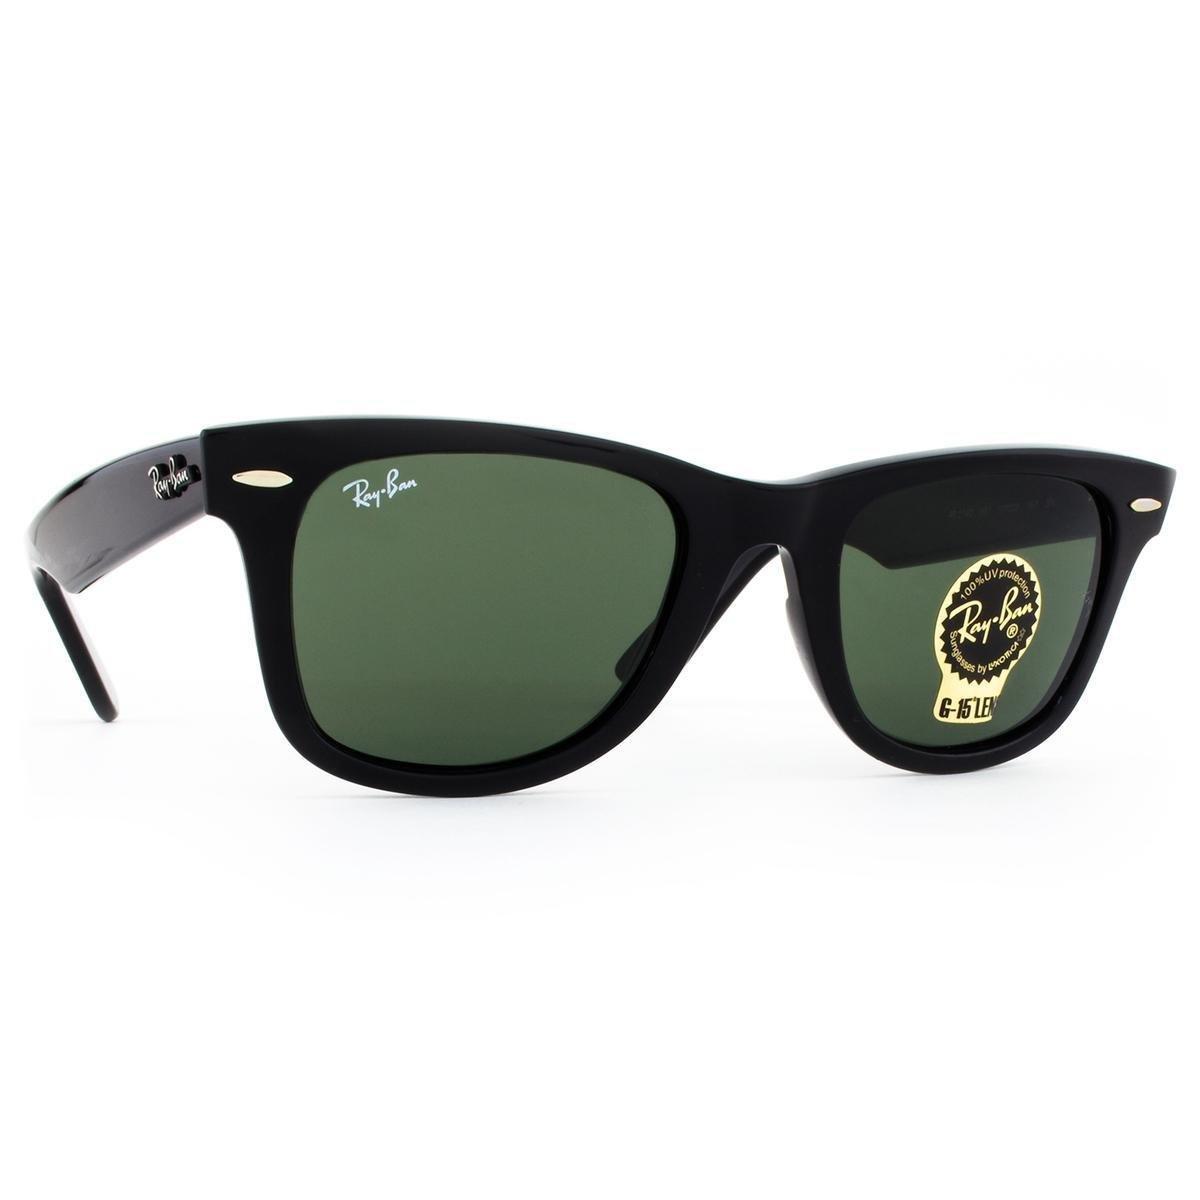 ... Óculos de Sol Ray Ban Wayfarer Classic RB2140 901-50 Masculino ... ac8797c936